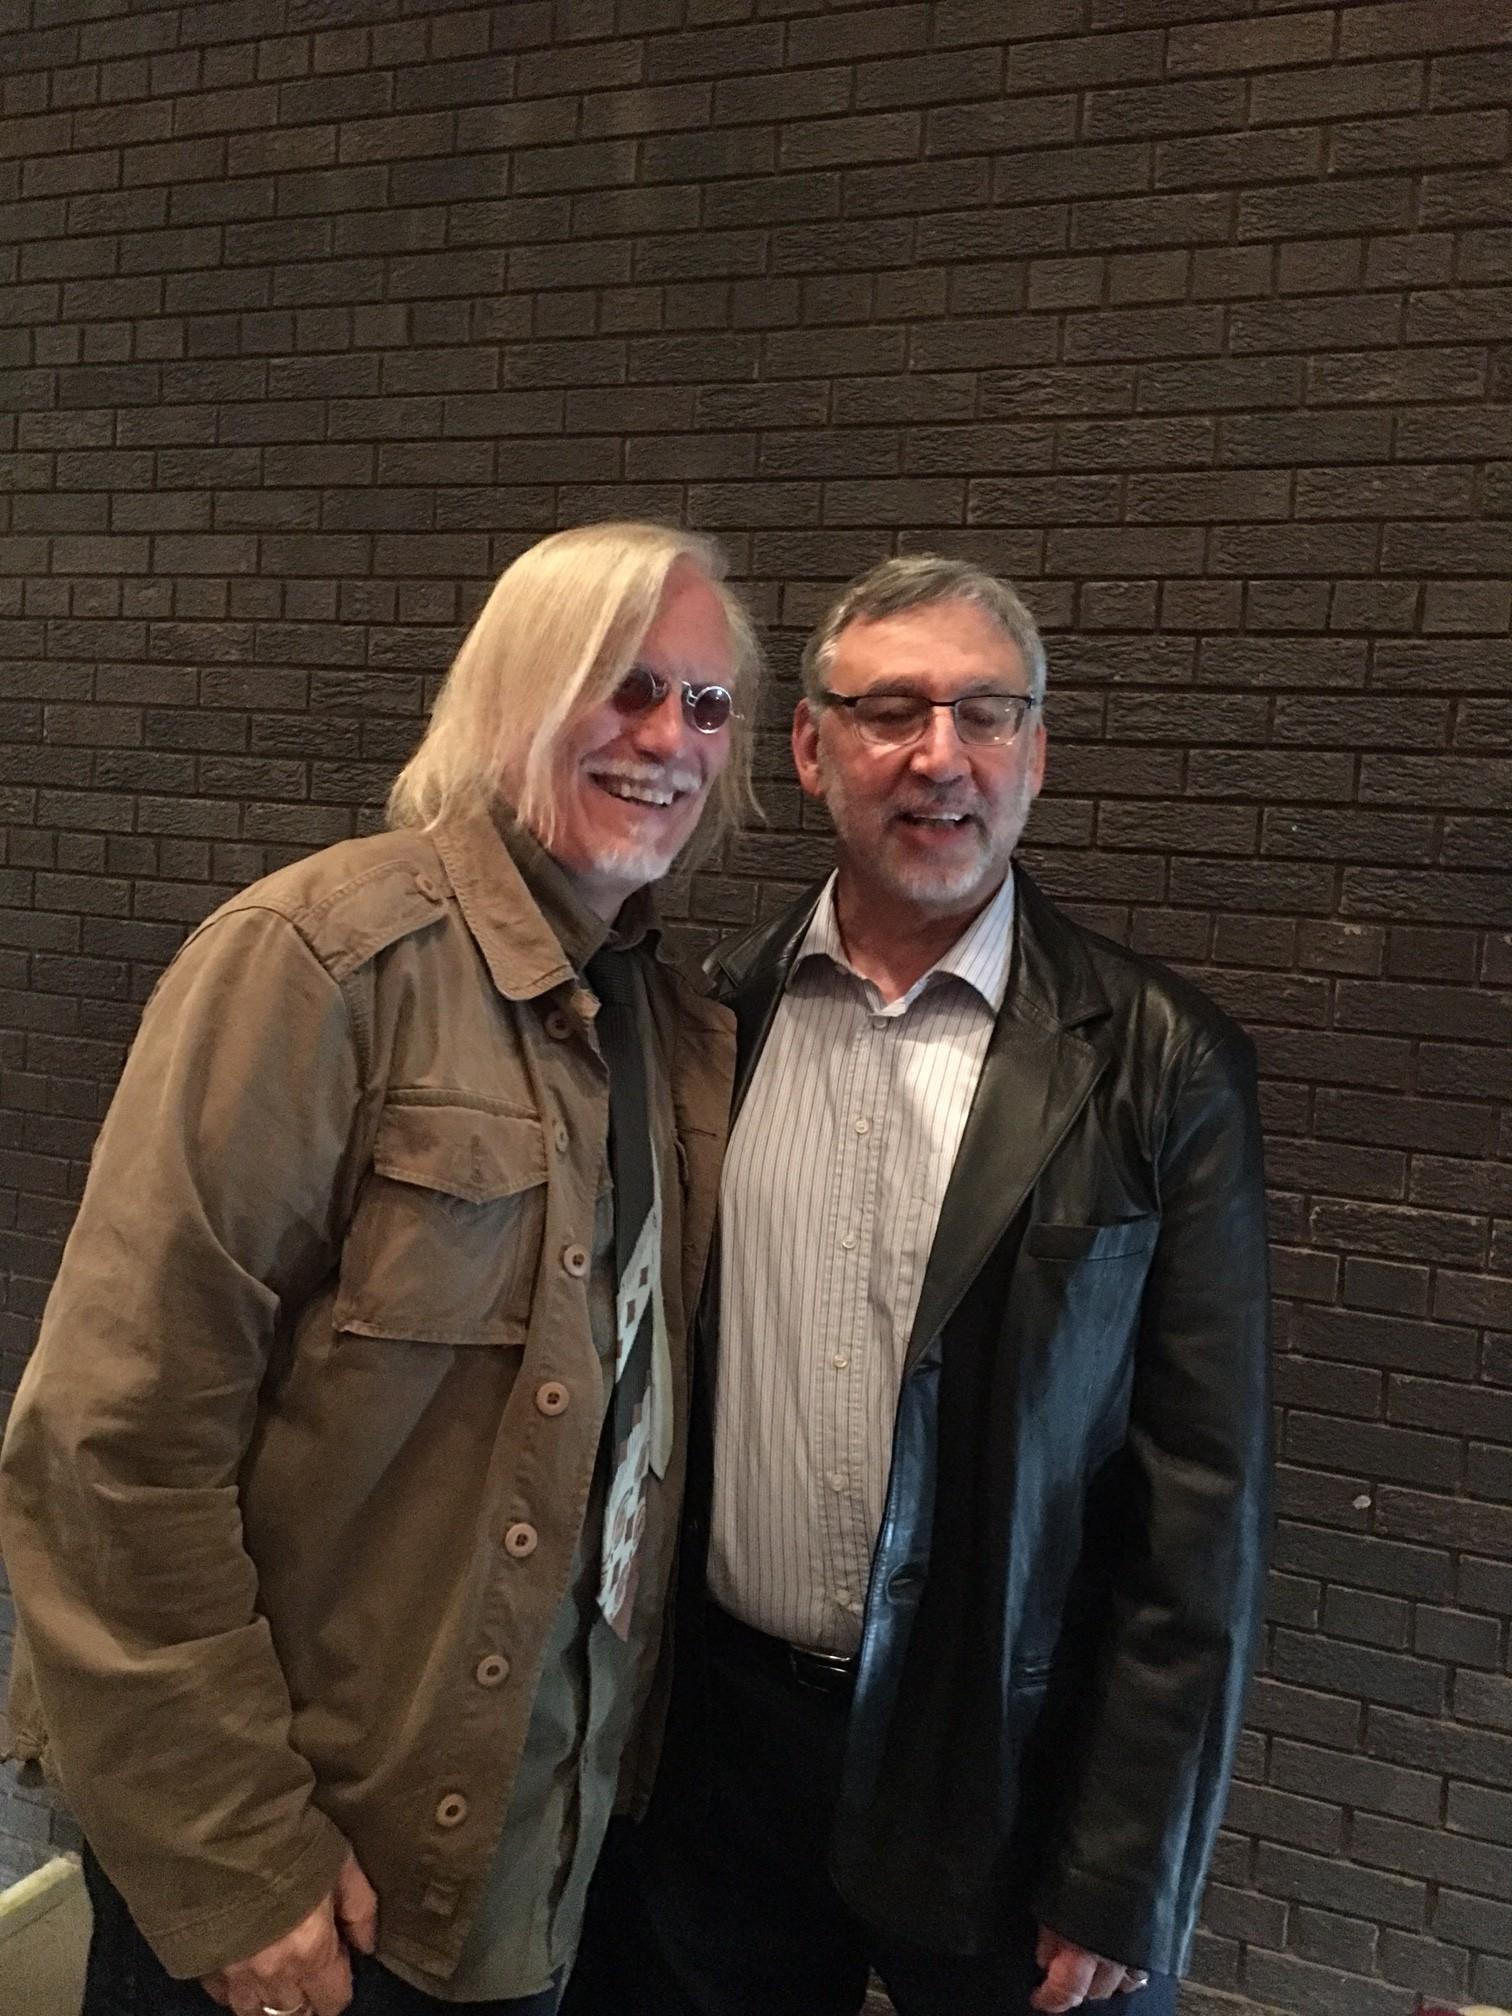 Peter and John Portelli